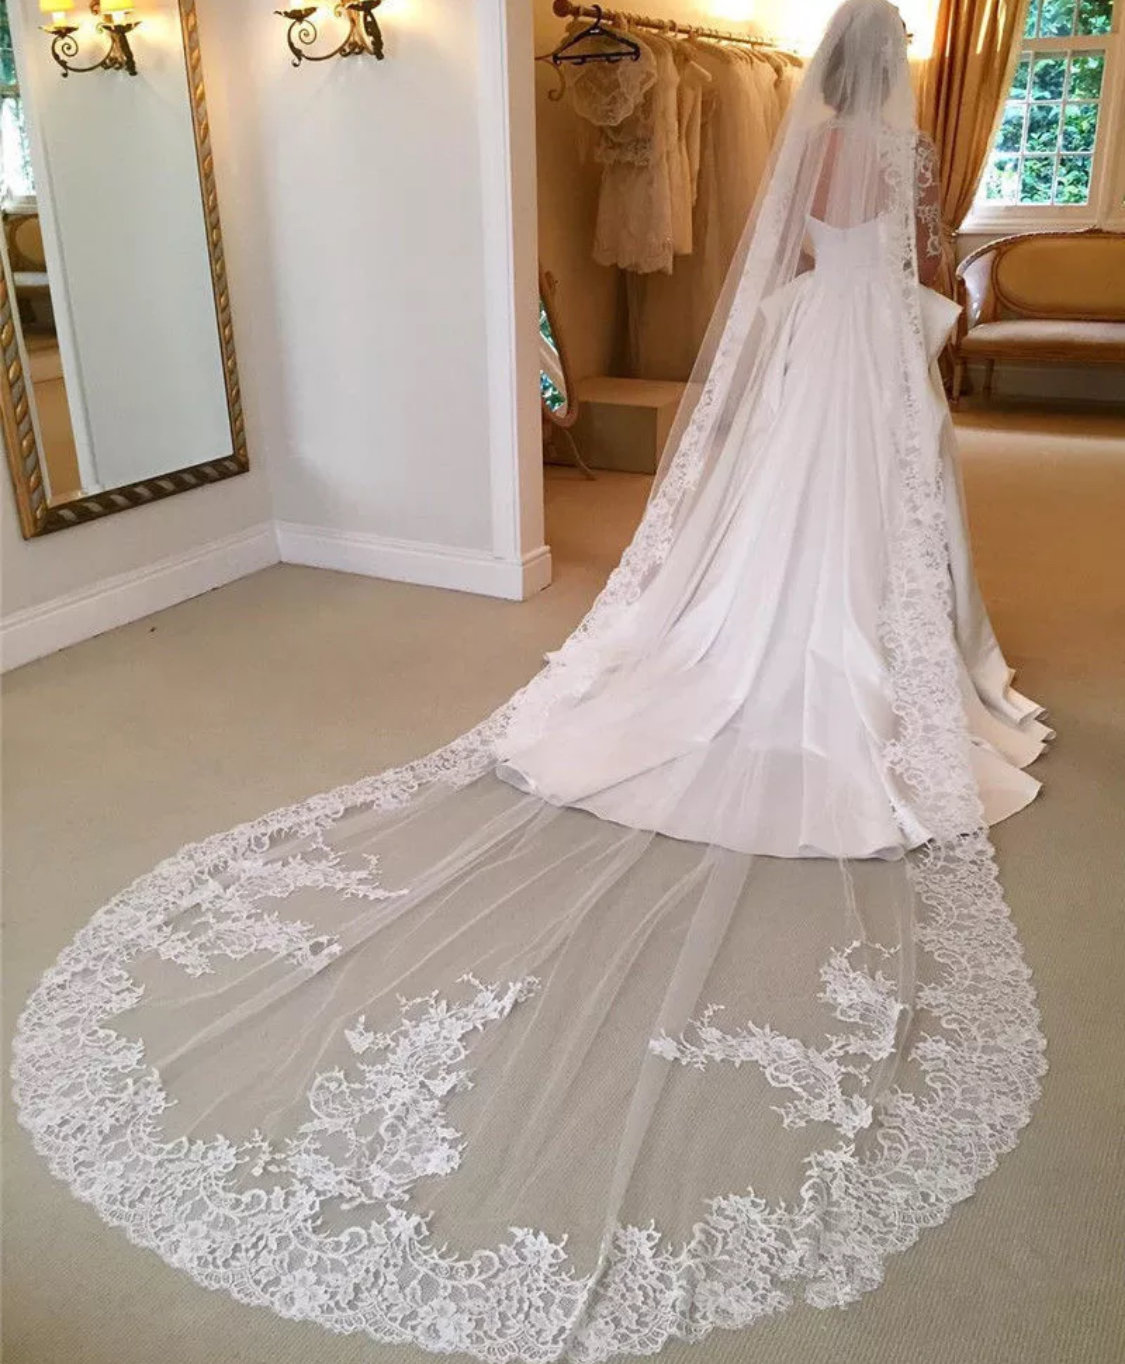 Custom 3M/4M/5M/6M White/Ivory 1T Cathedral Wedding Bridal Lace Edge Veil+Comb $70-$100